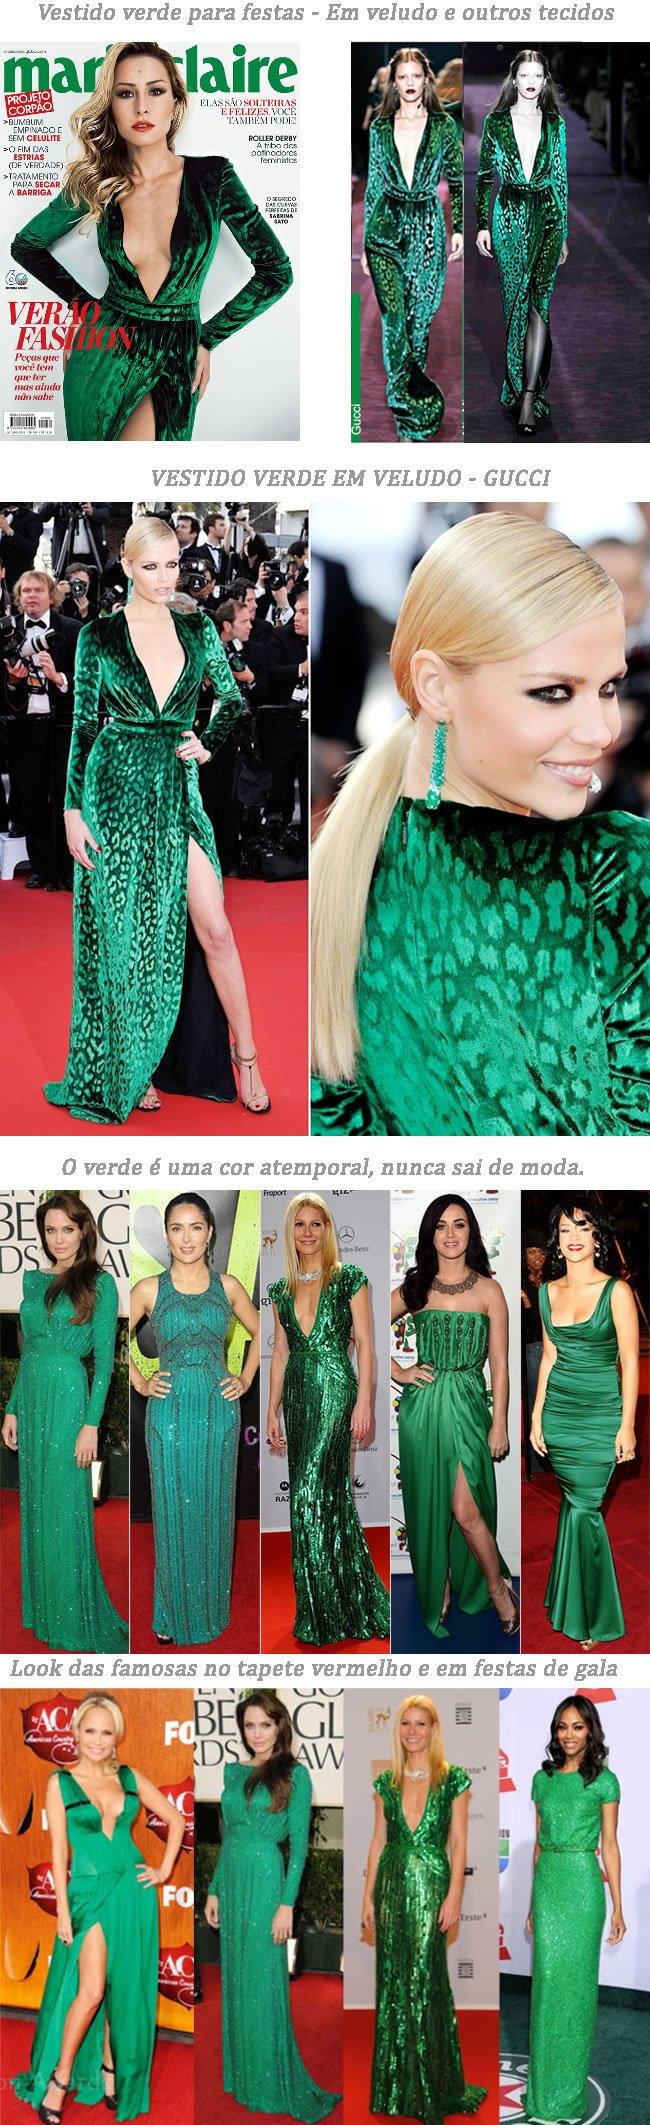 vestido verde para festa